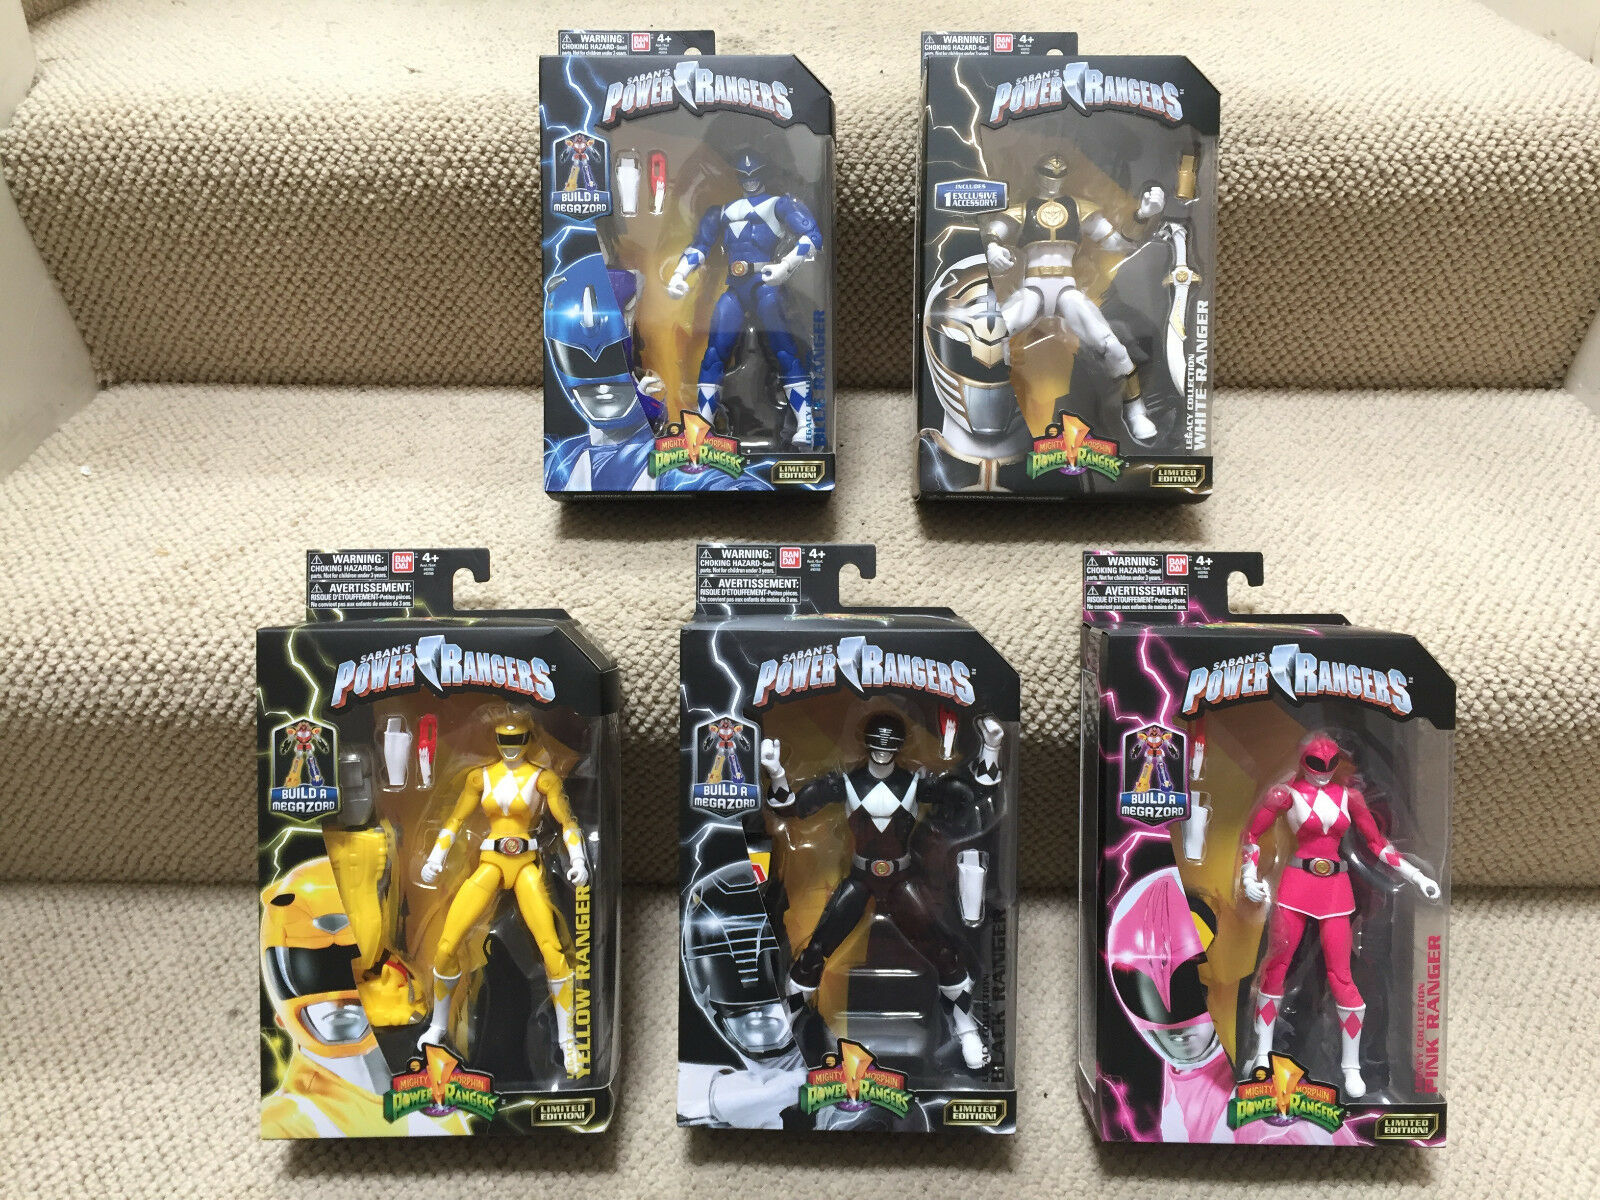 Lot de 5  Legacy Power Rangers Blanc Rose Bleu Jaune & Noir Figure toys Mighty Morphin Power Rangers